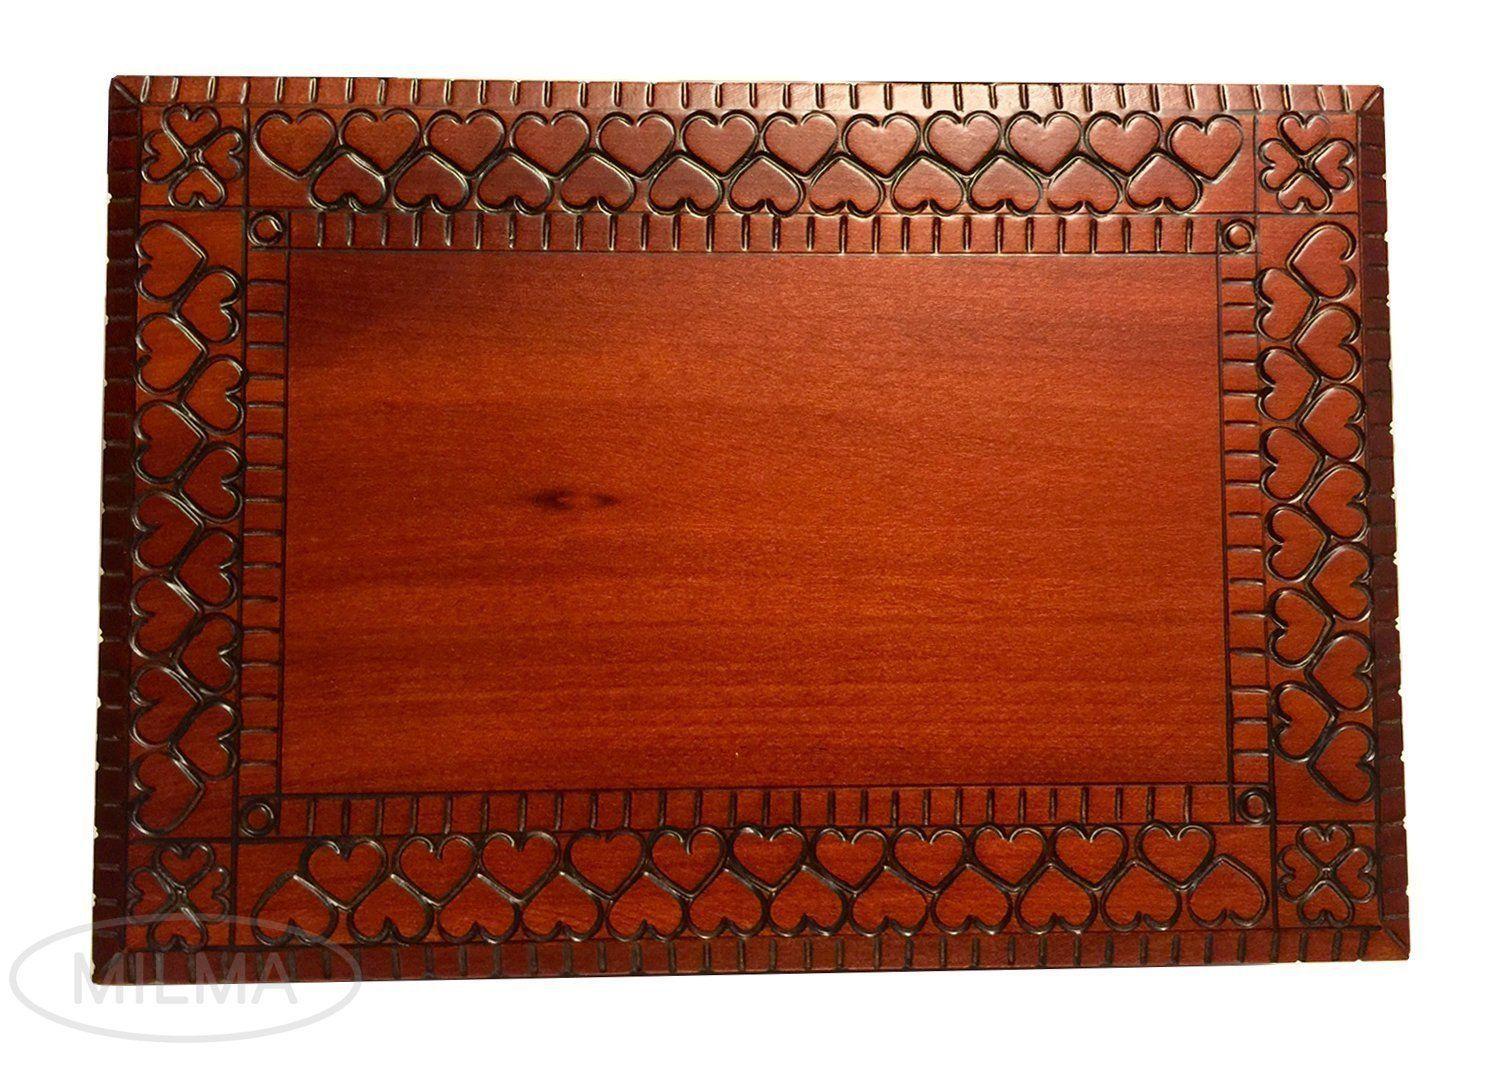 Large Handmade HEART Wooden Box Jewelry Box Keepsake Lock &  Key Made in Poland